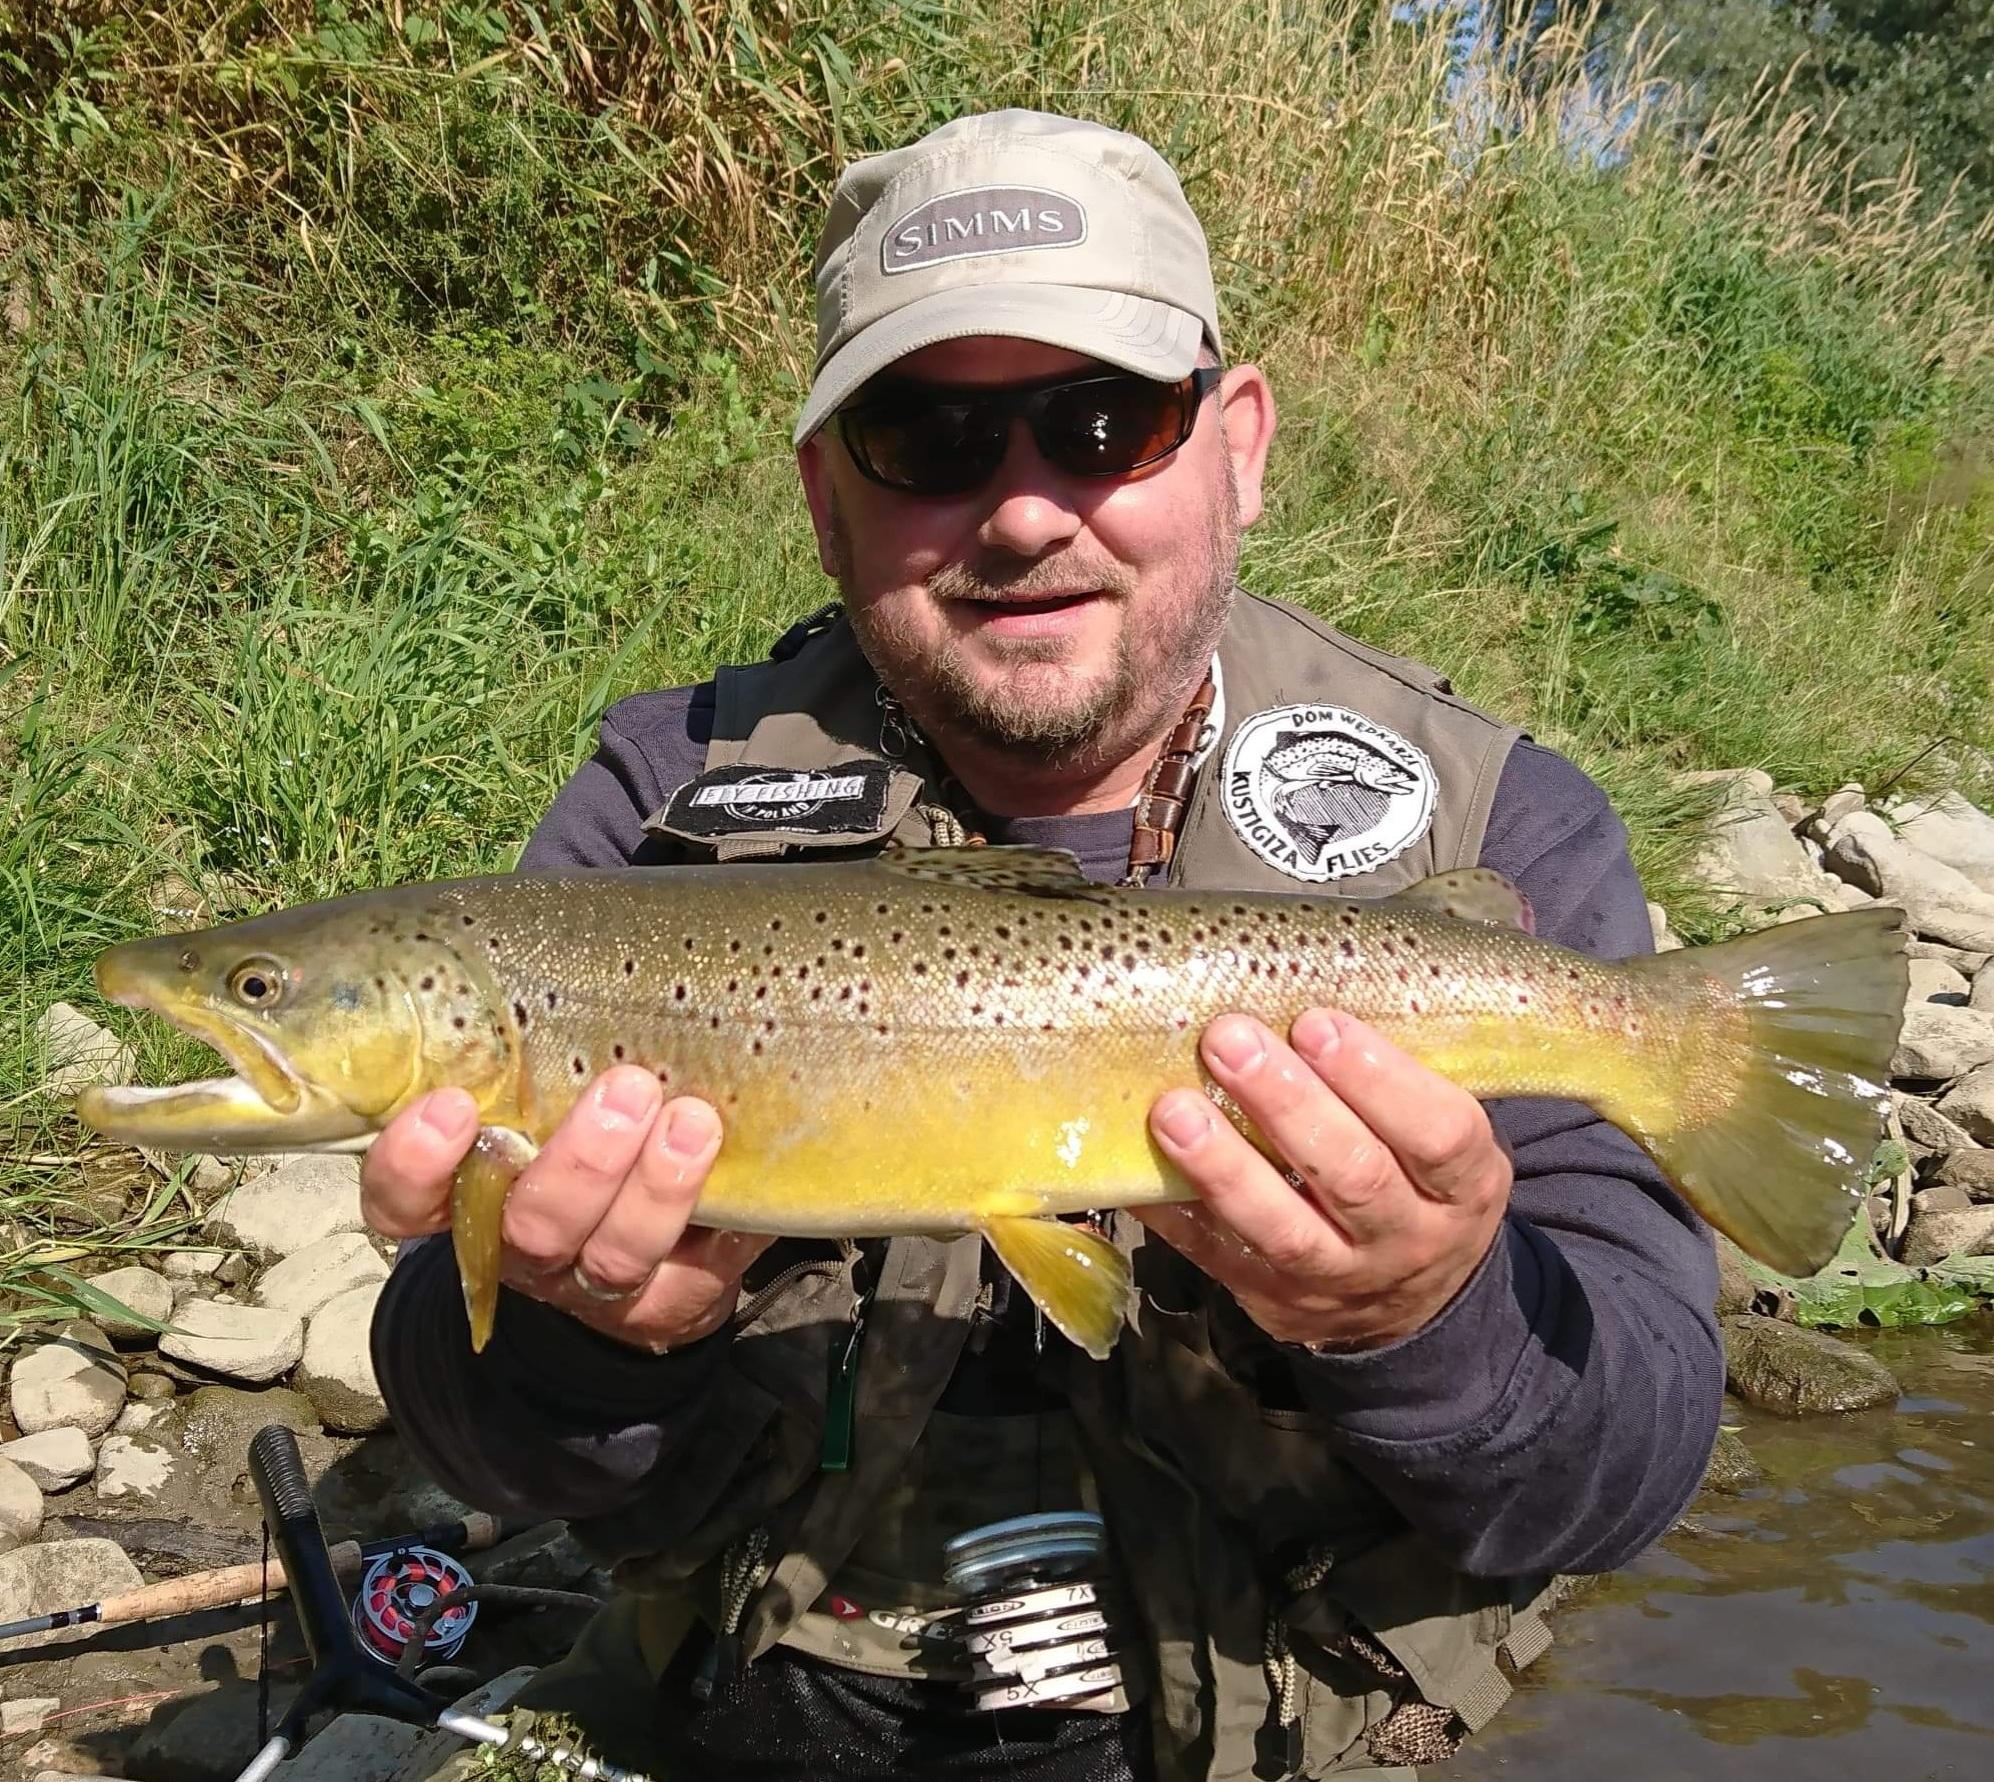 My friend From Belgium Fly Fishing - Great Angler Peche à la mouche en Pologne